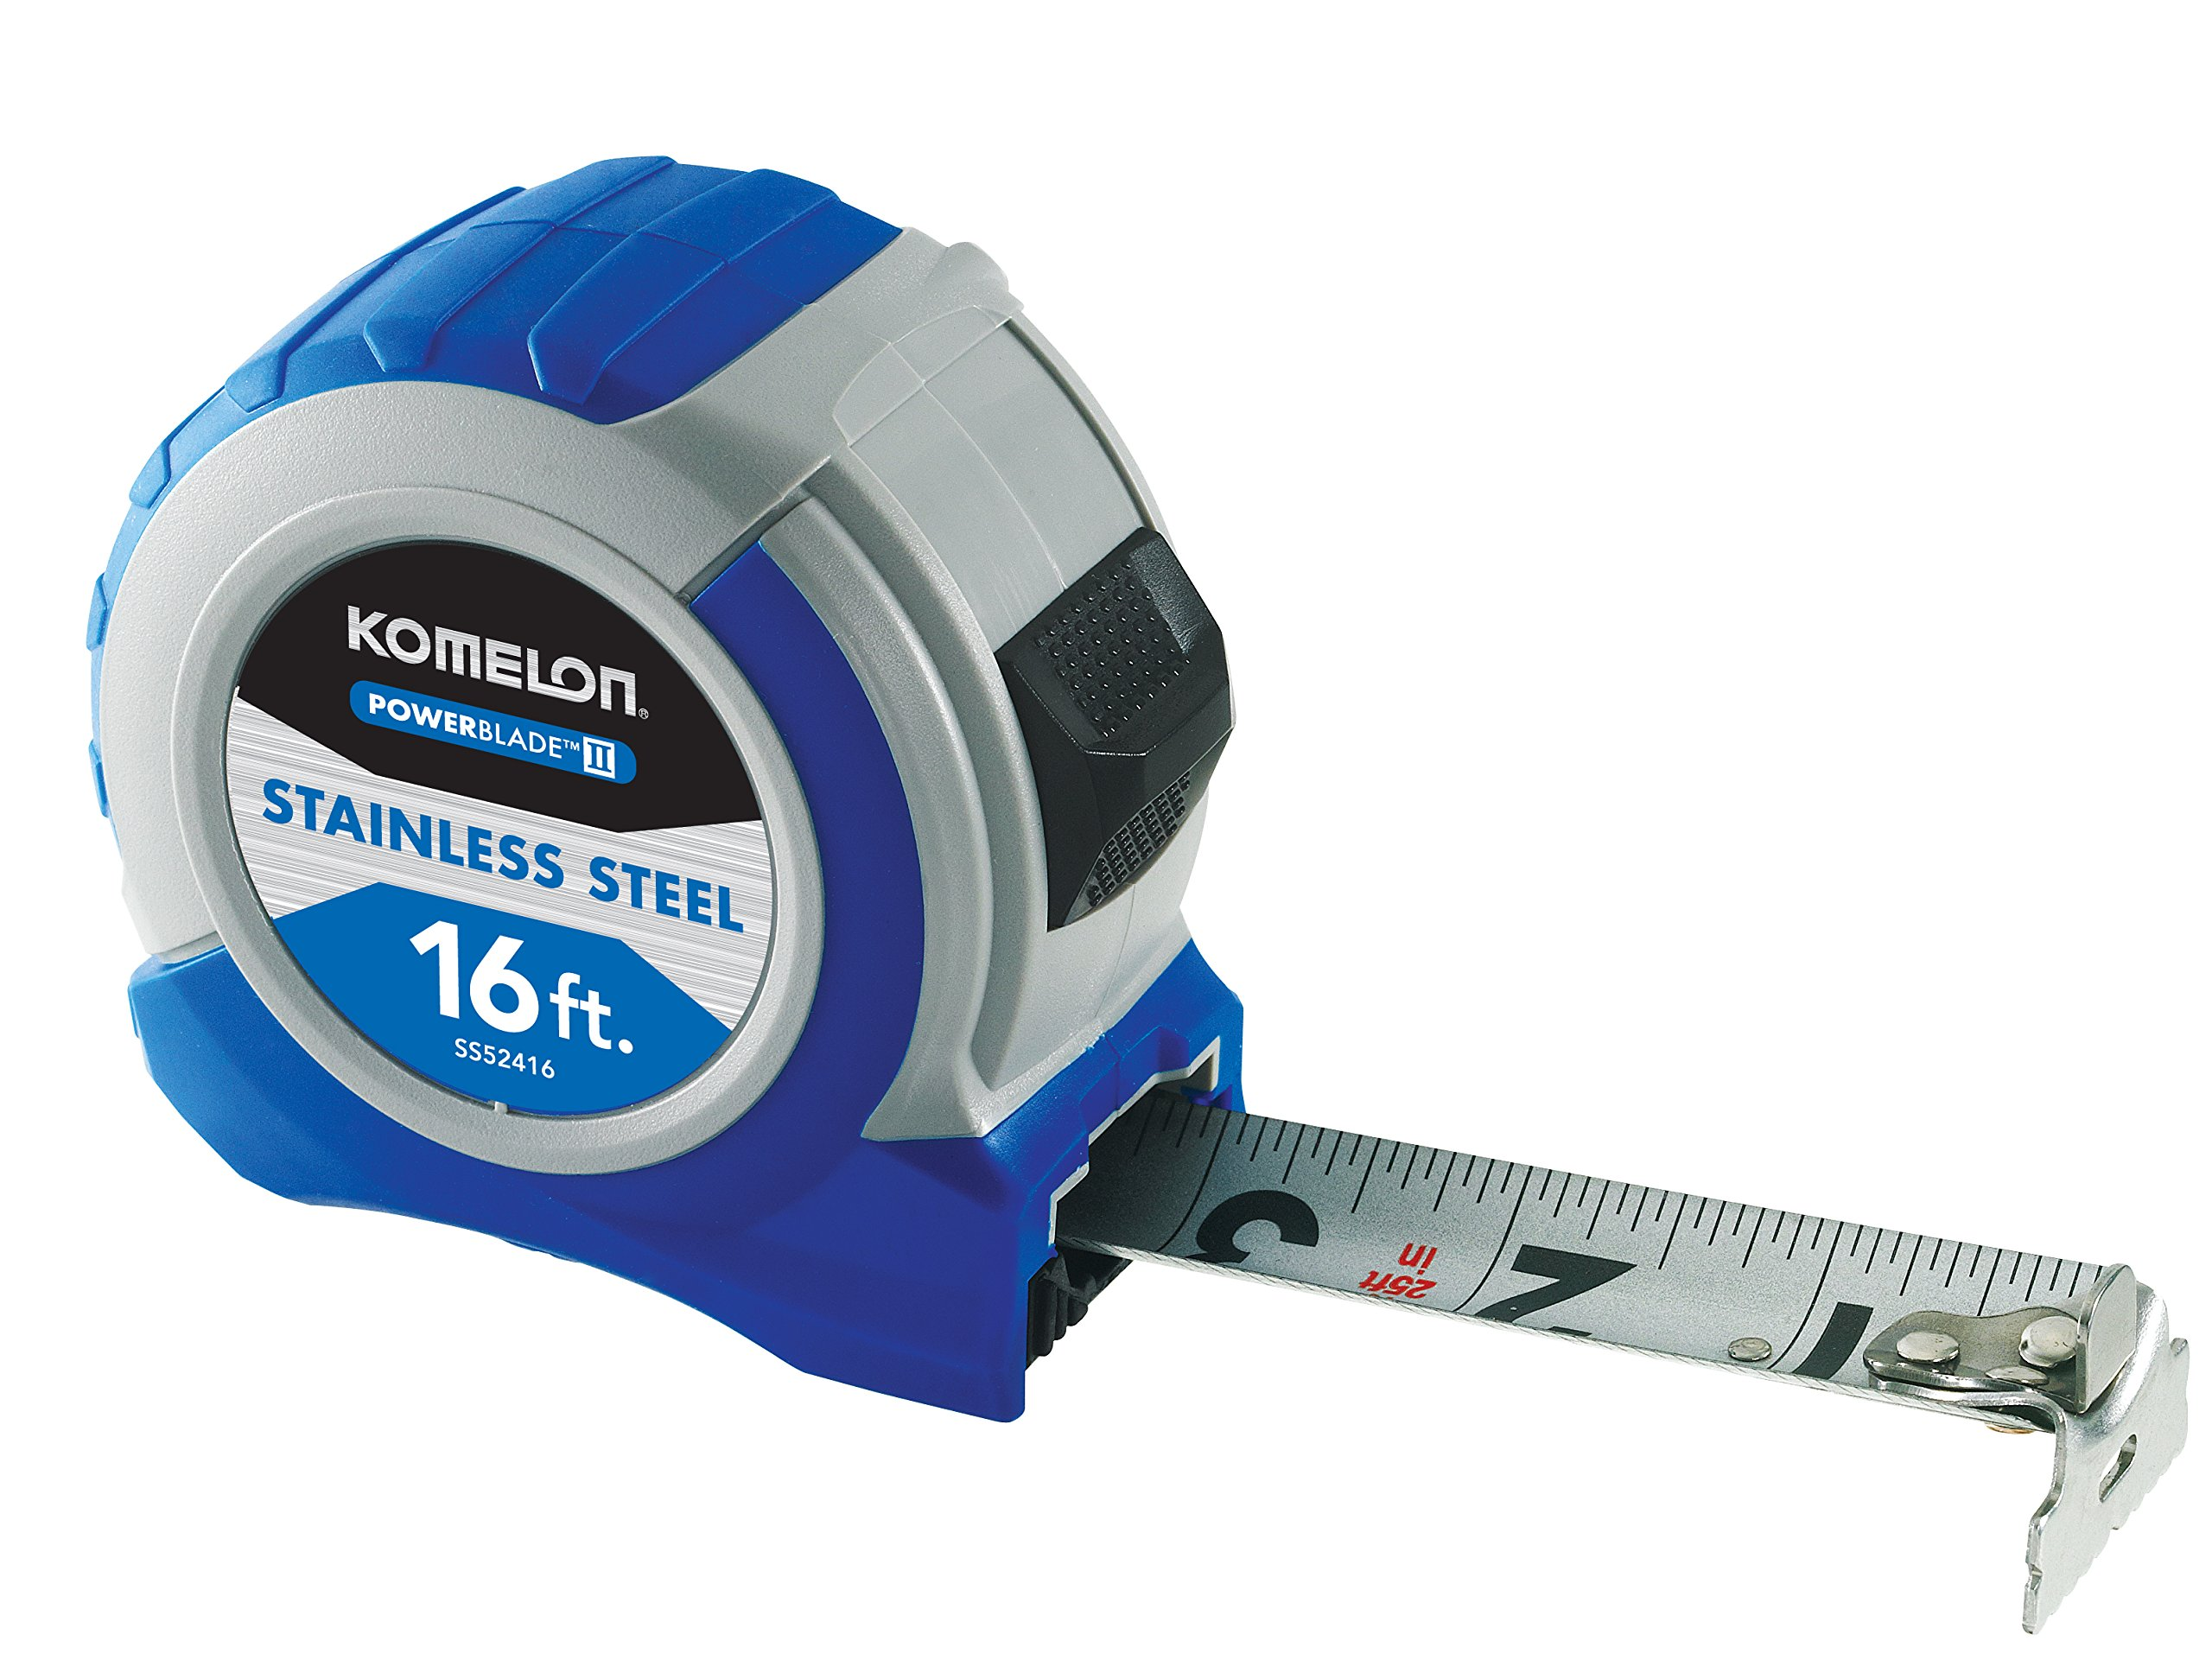 Komelon SS52416 Powerblade II Tape Measures, Small, Blue/Grey